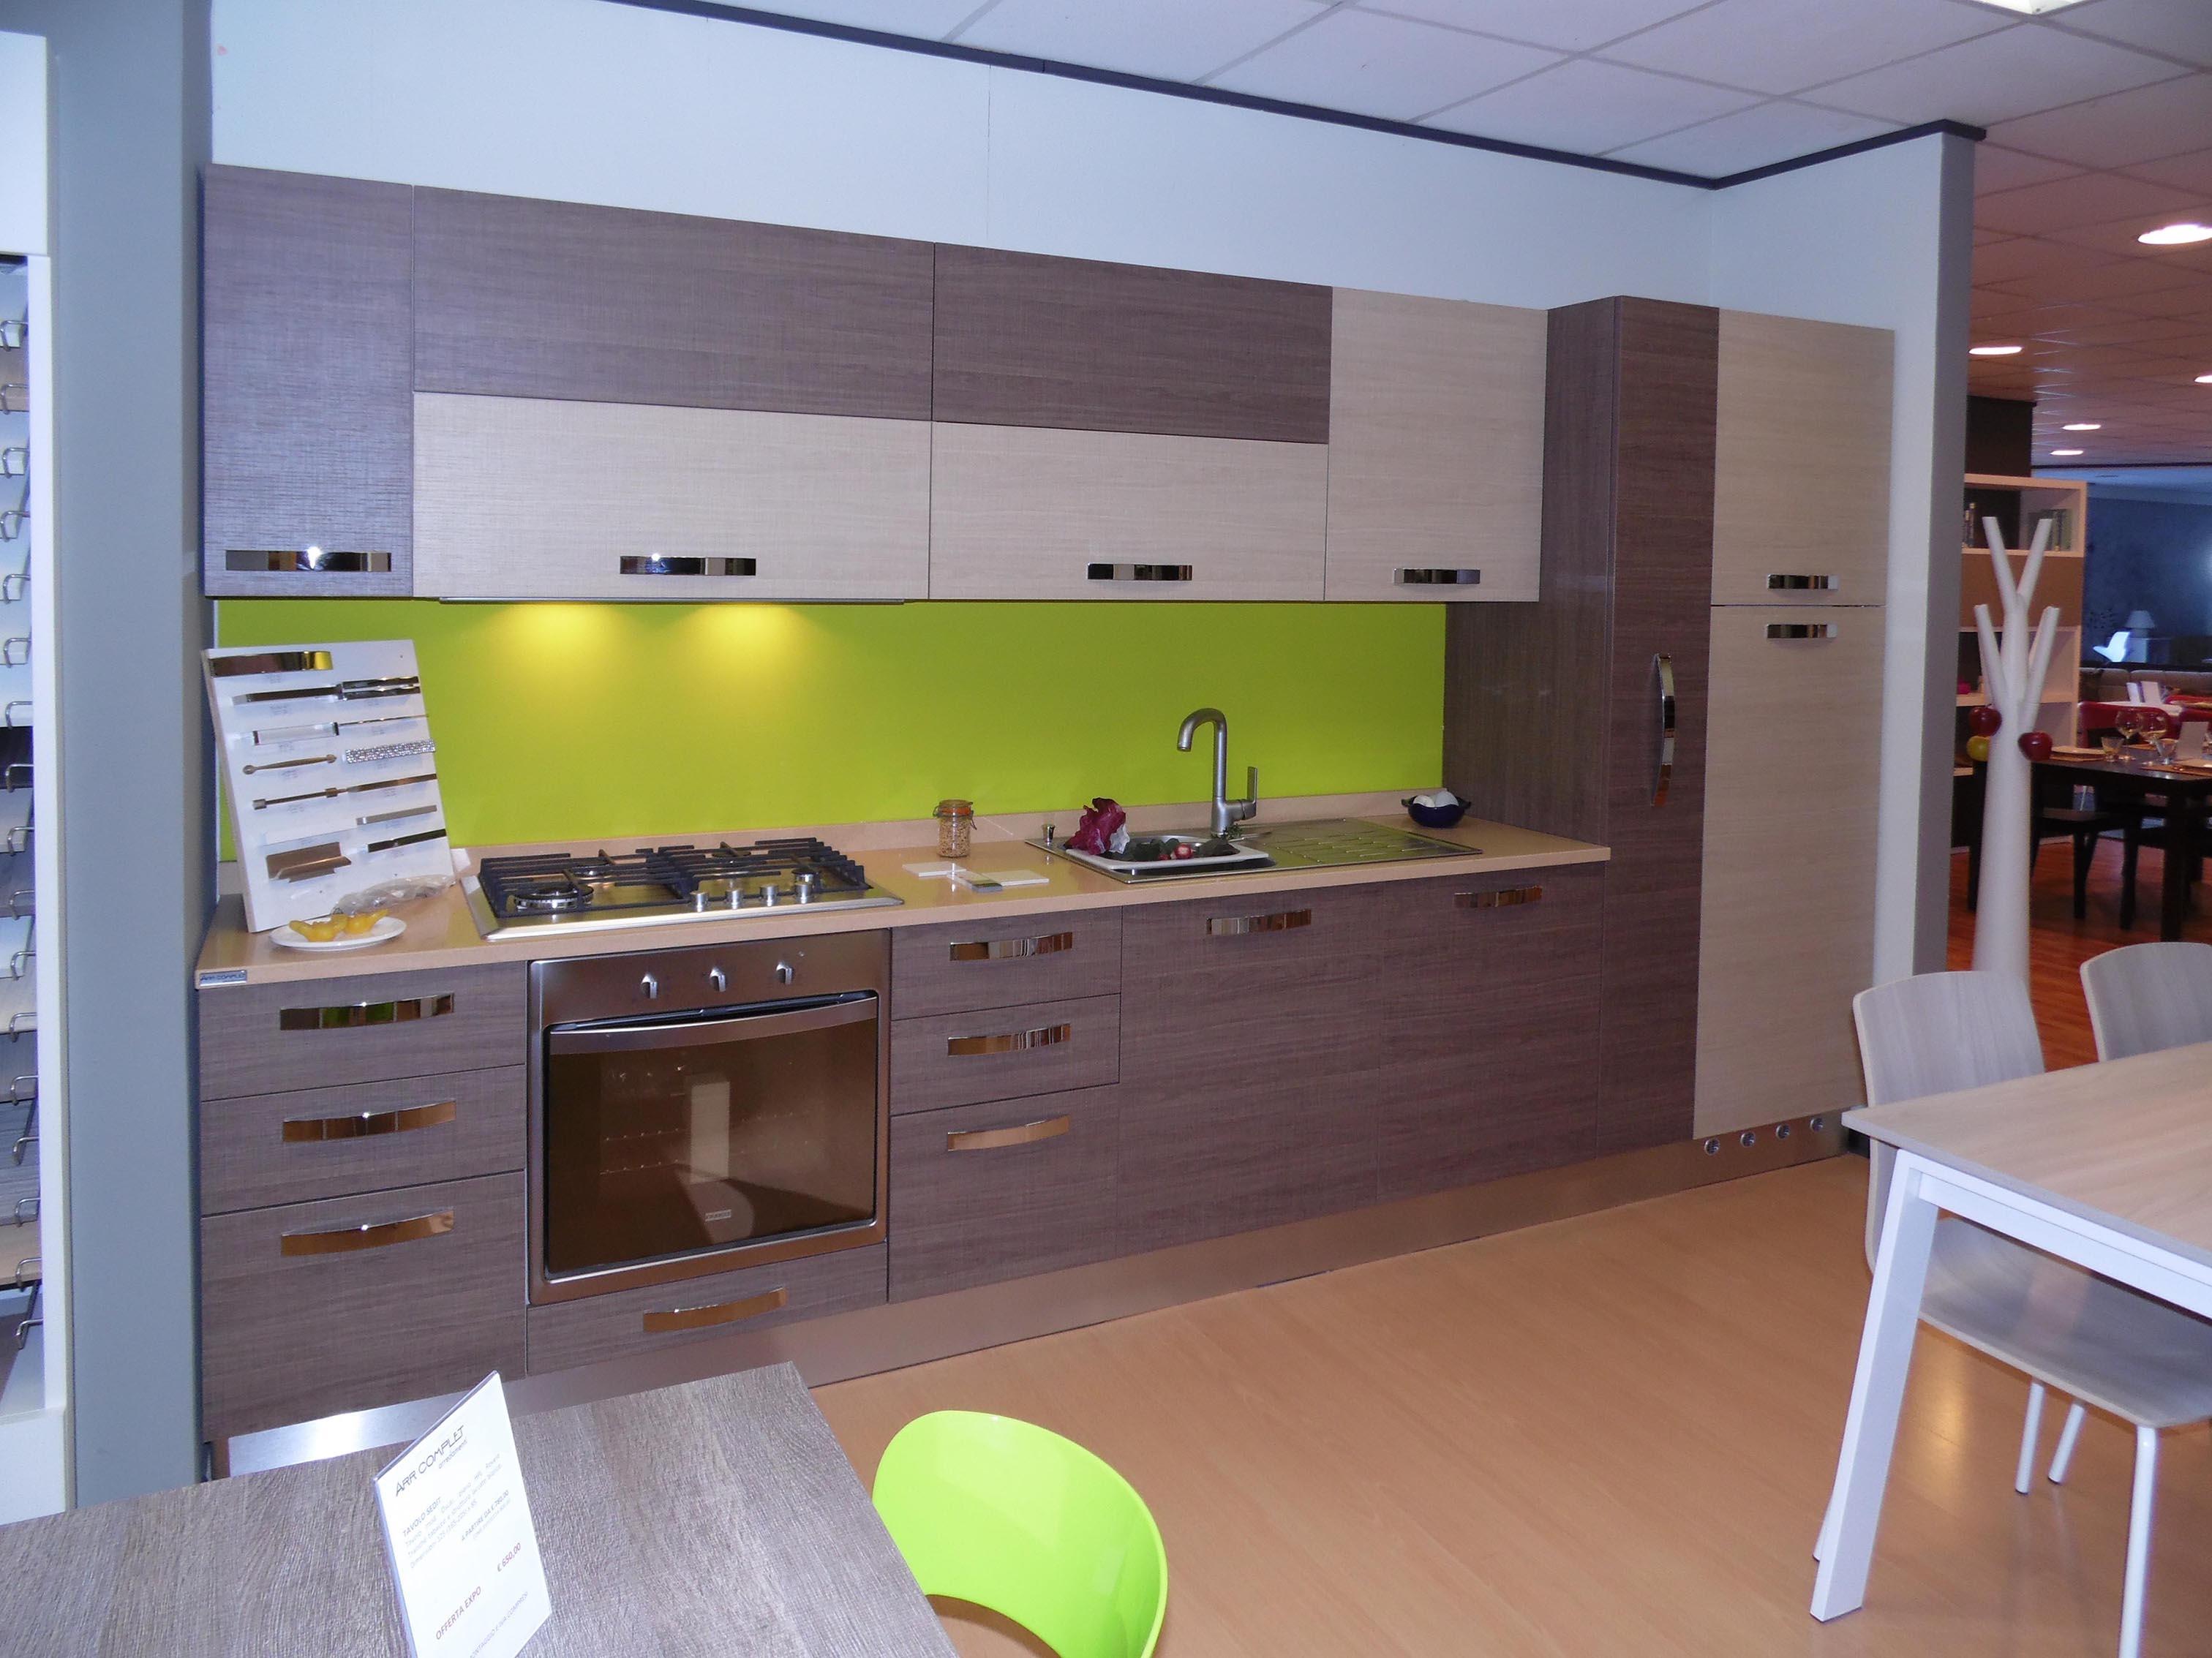 Cucina Astra Cucine Iride Sconto 75 Laminato Materico